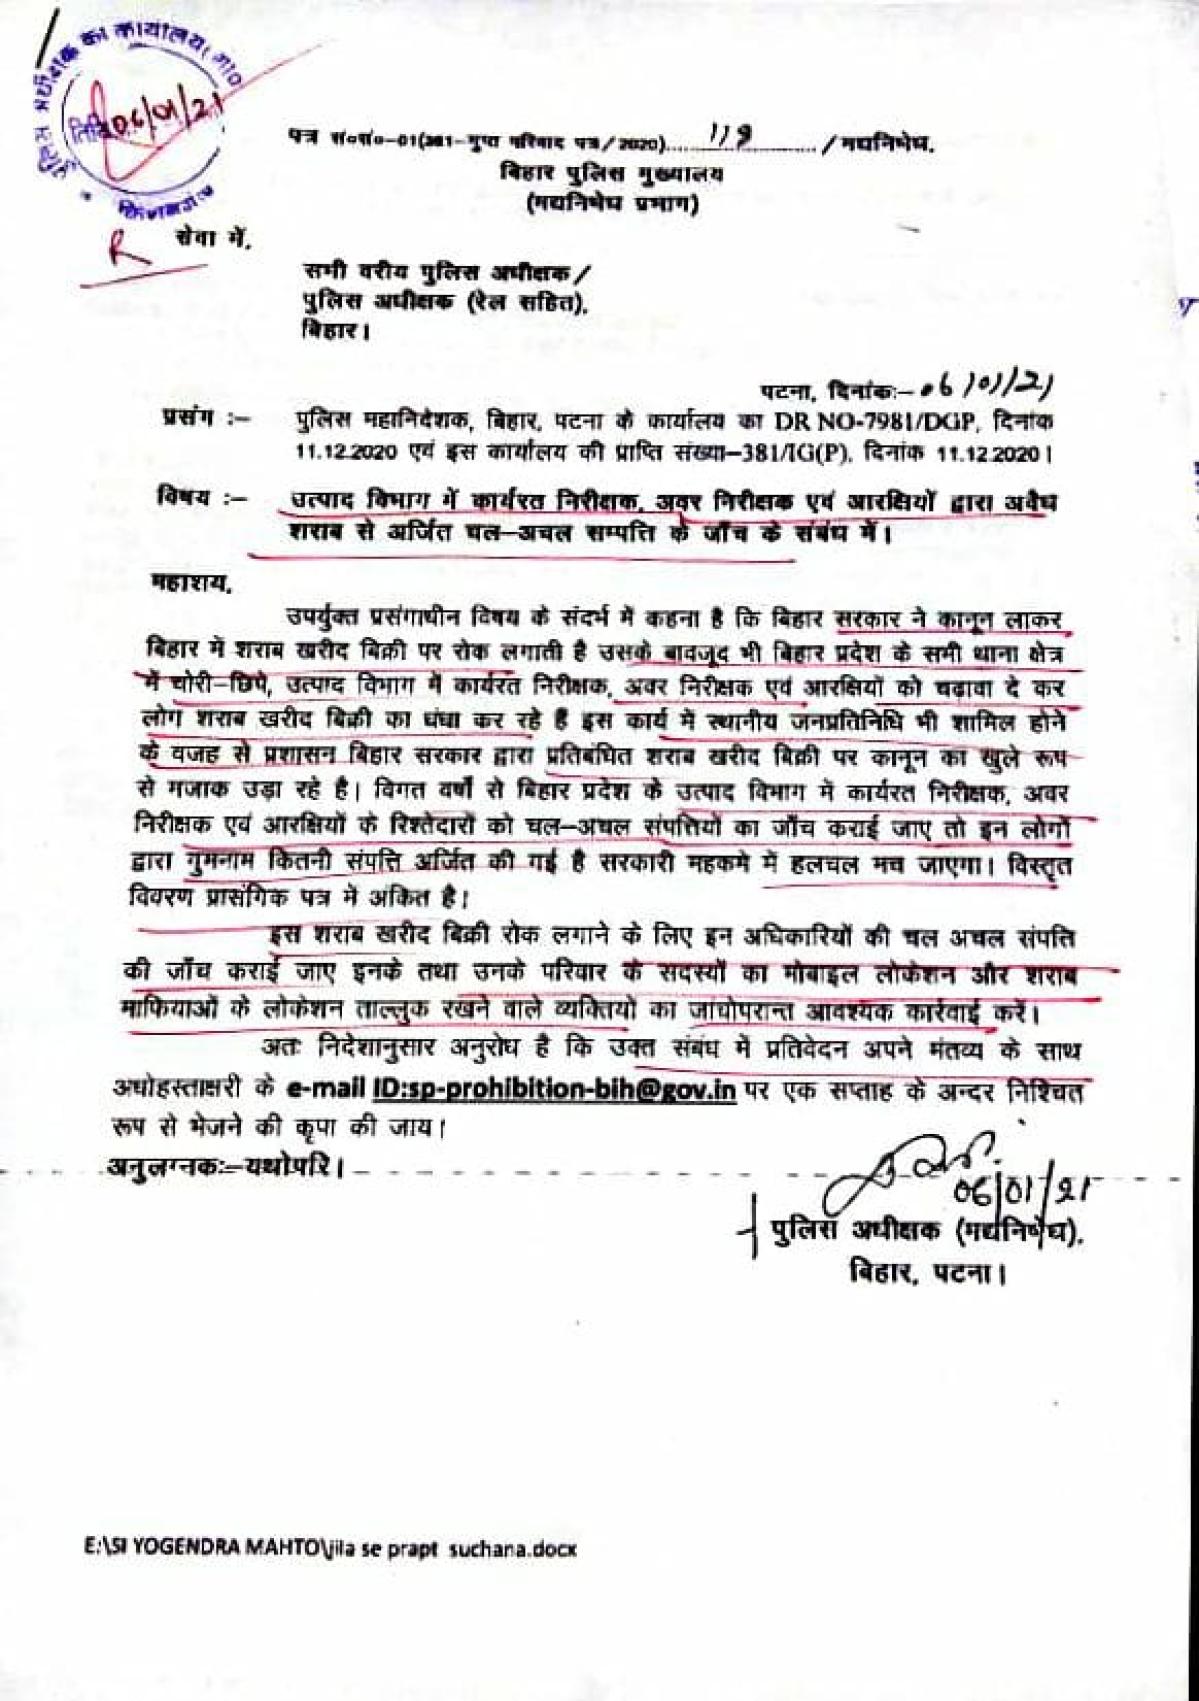 Bihar: Prohibition dept SP's letter confirms nexus between liquor mafia and excise officials